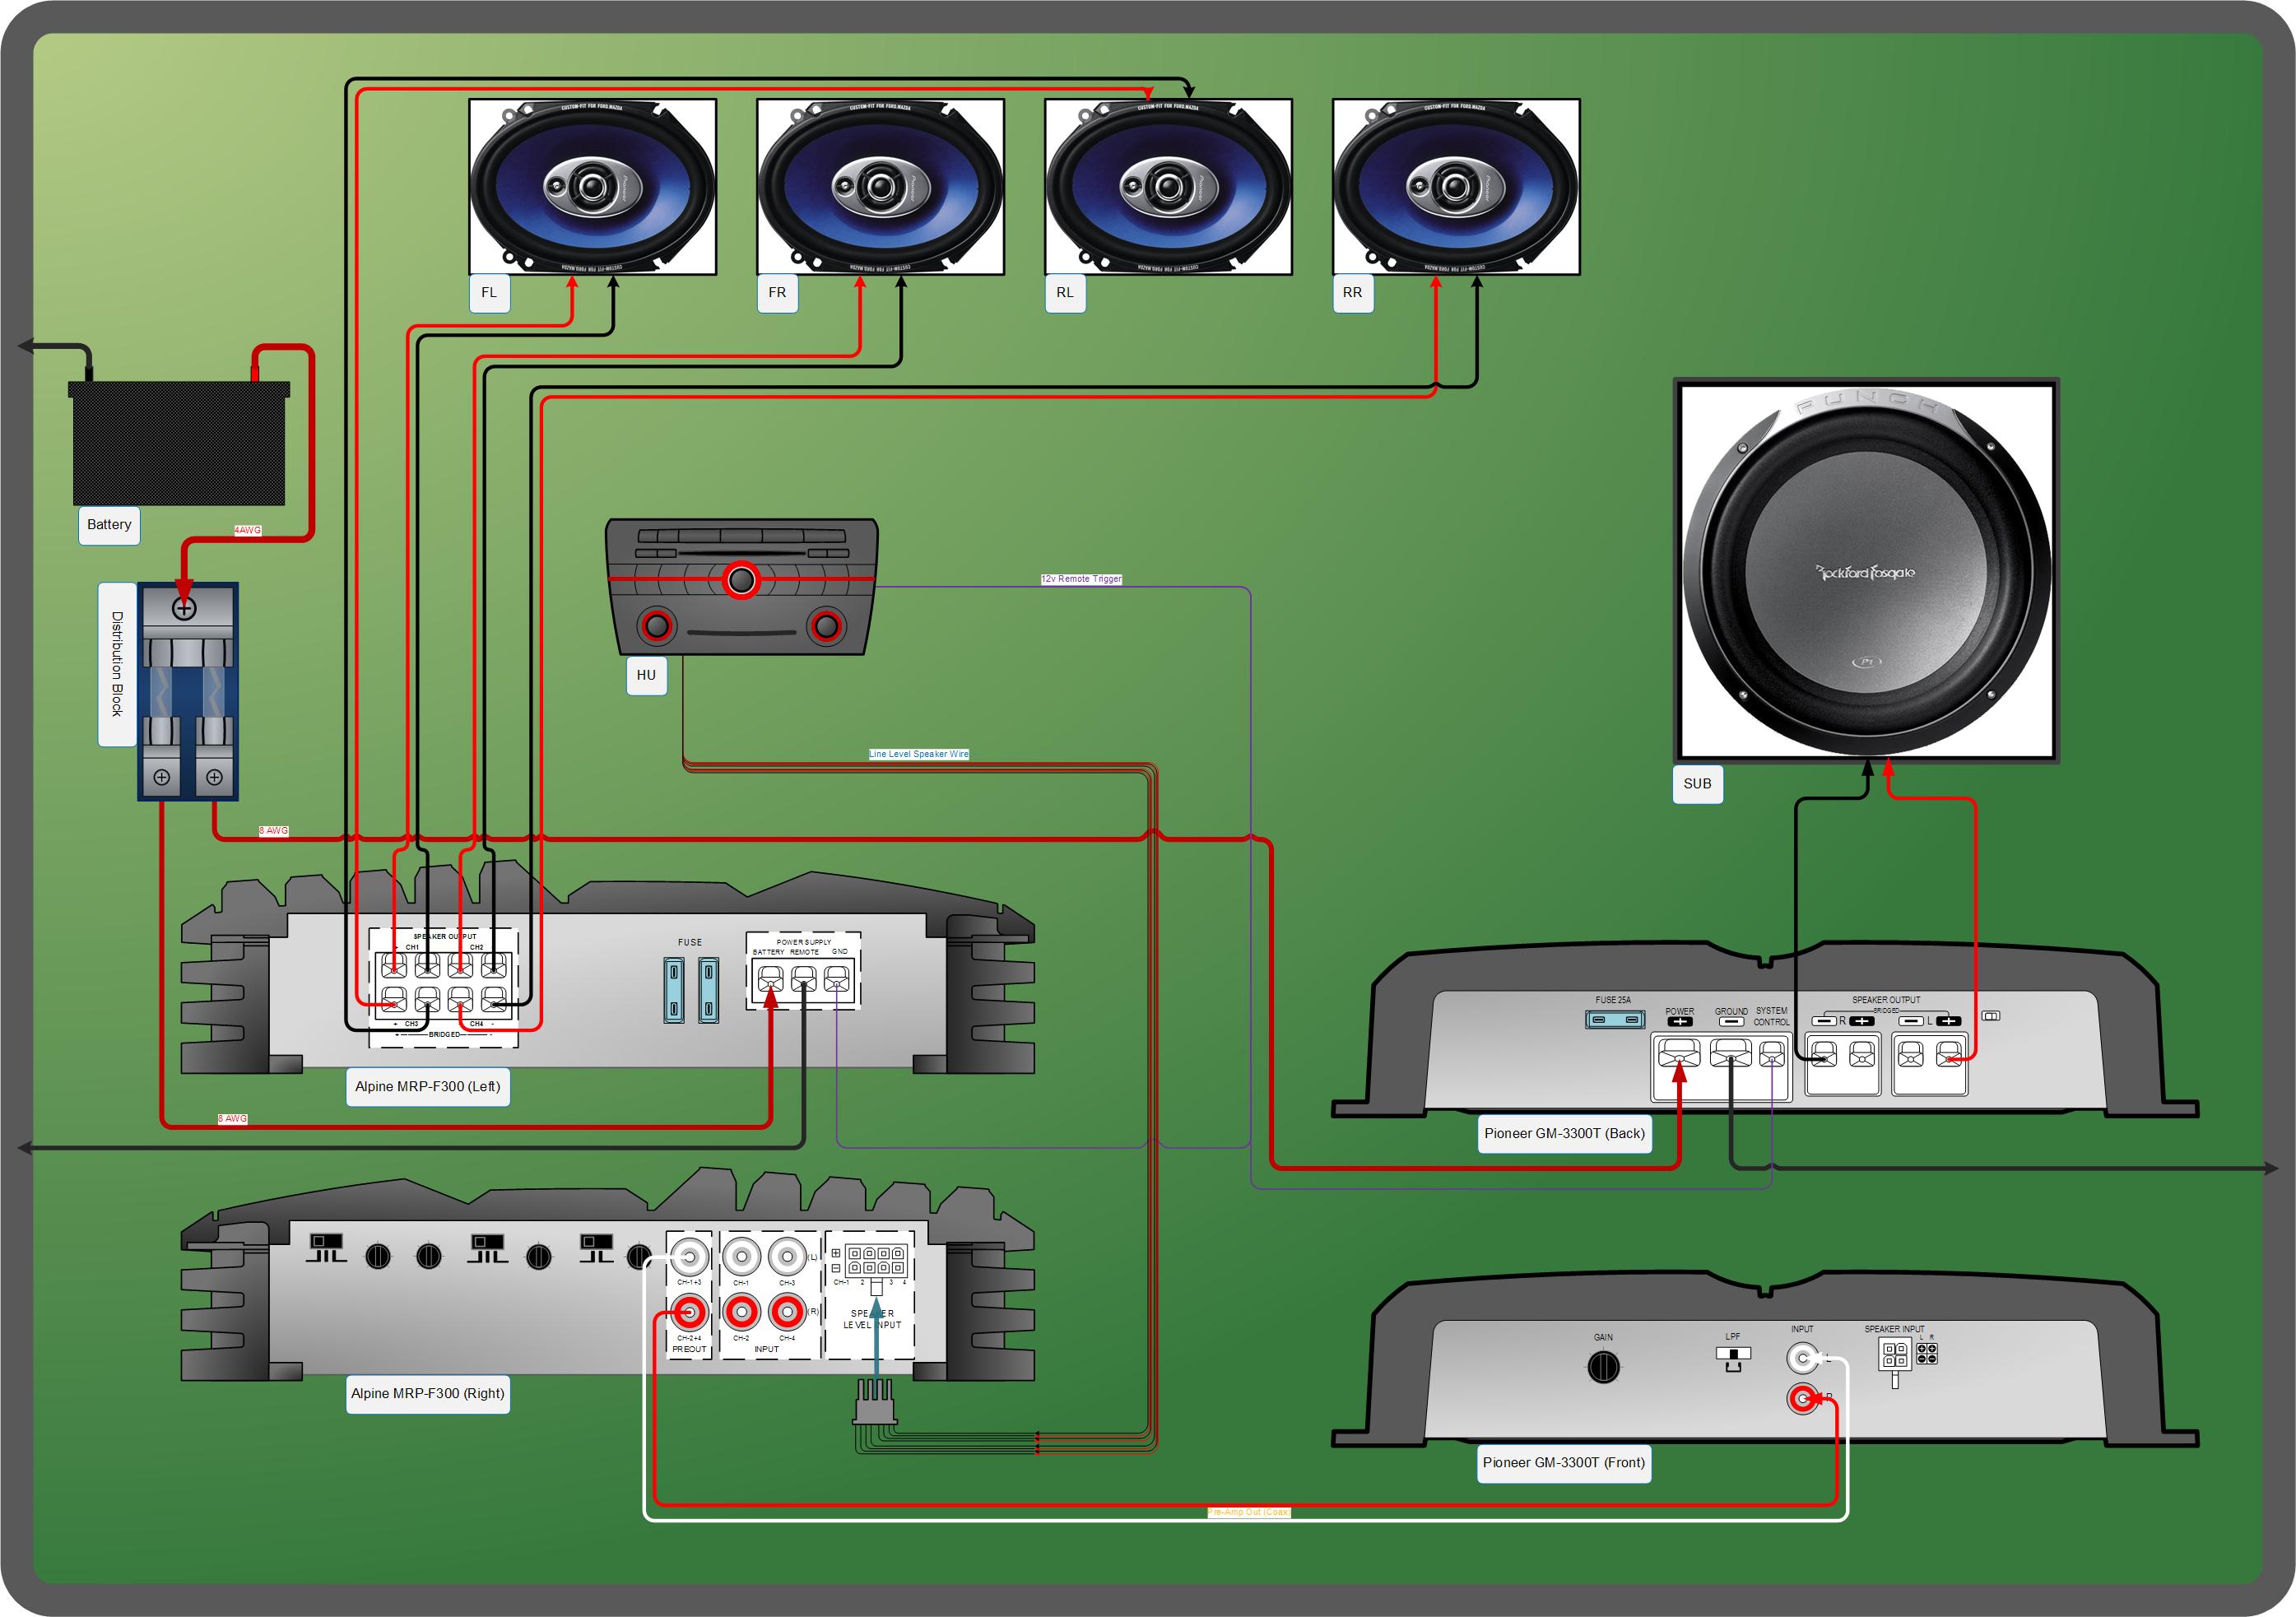 Car Amp Wiring | Wiring Diagram - Car Amplifier Wiring Diagram Installation